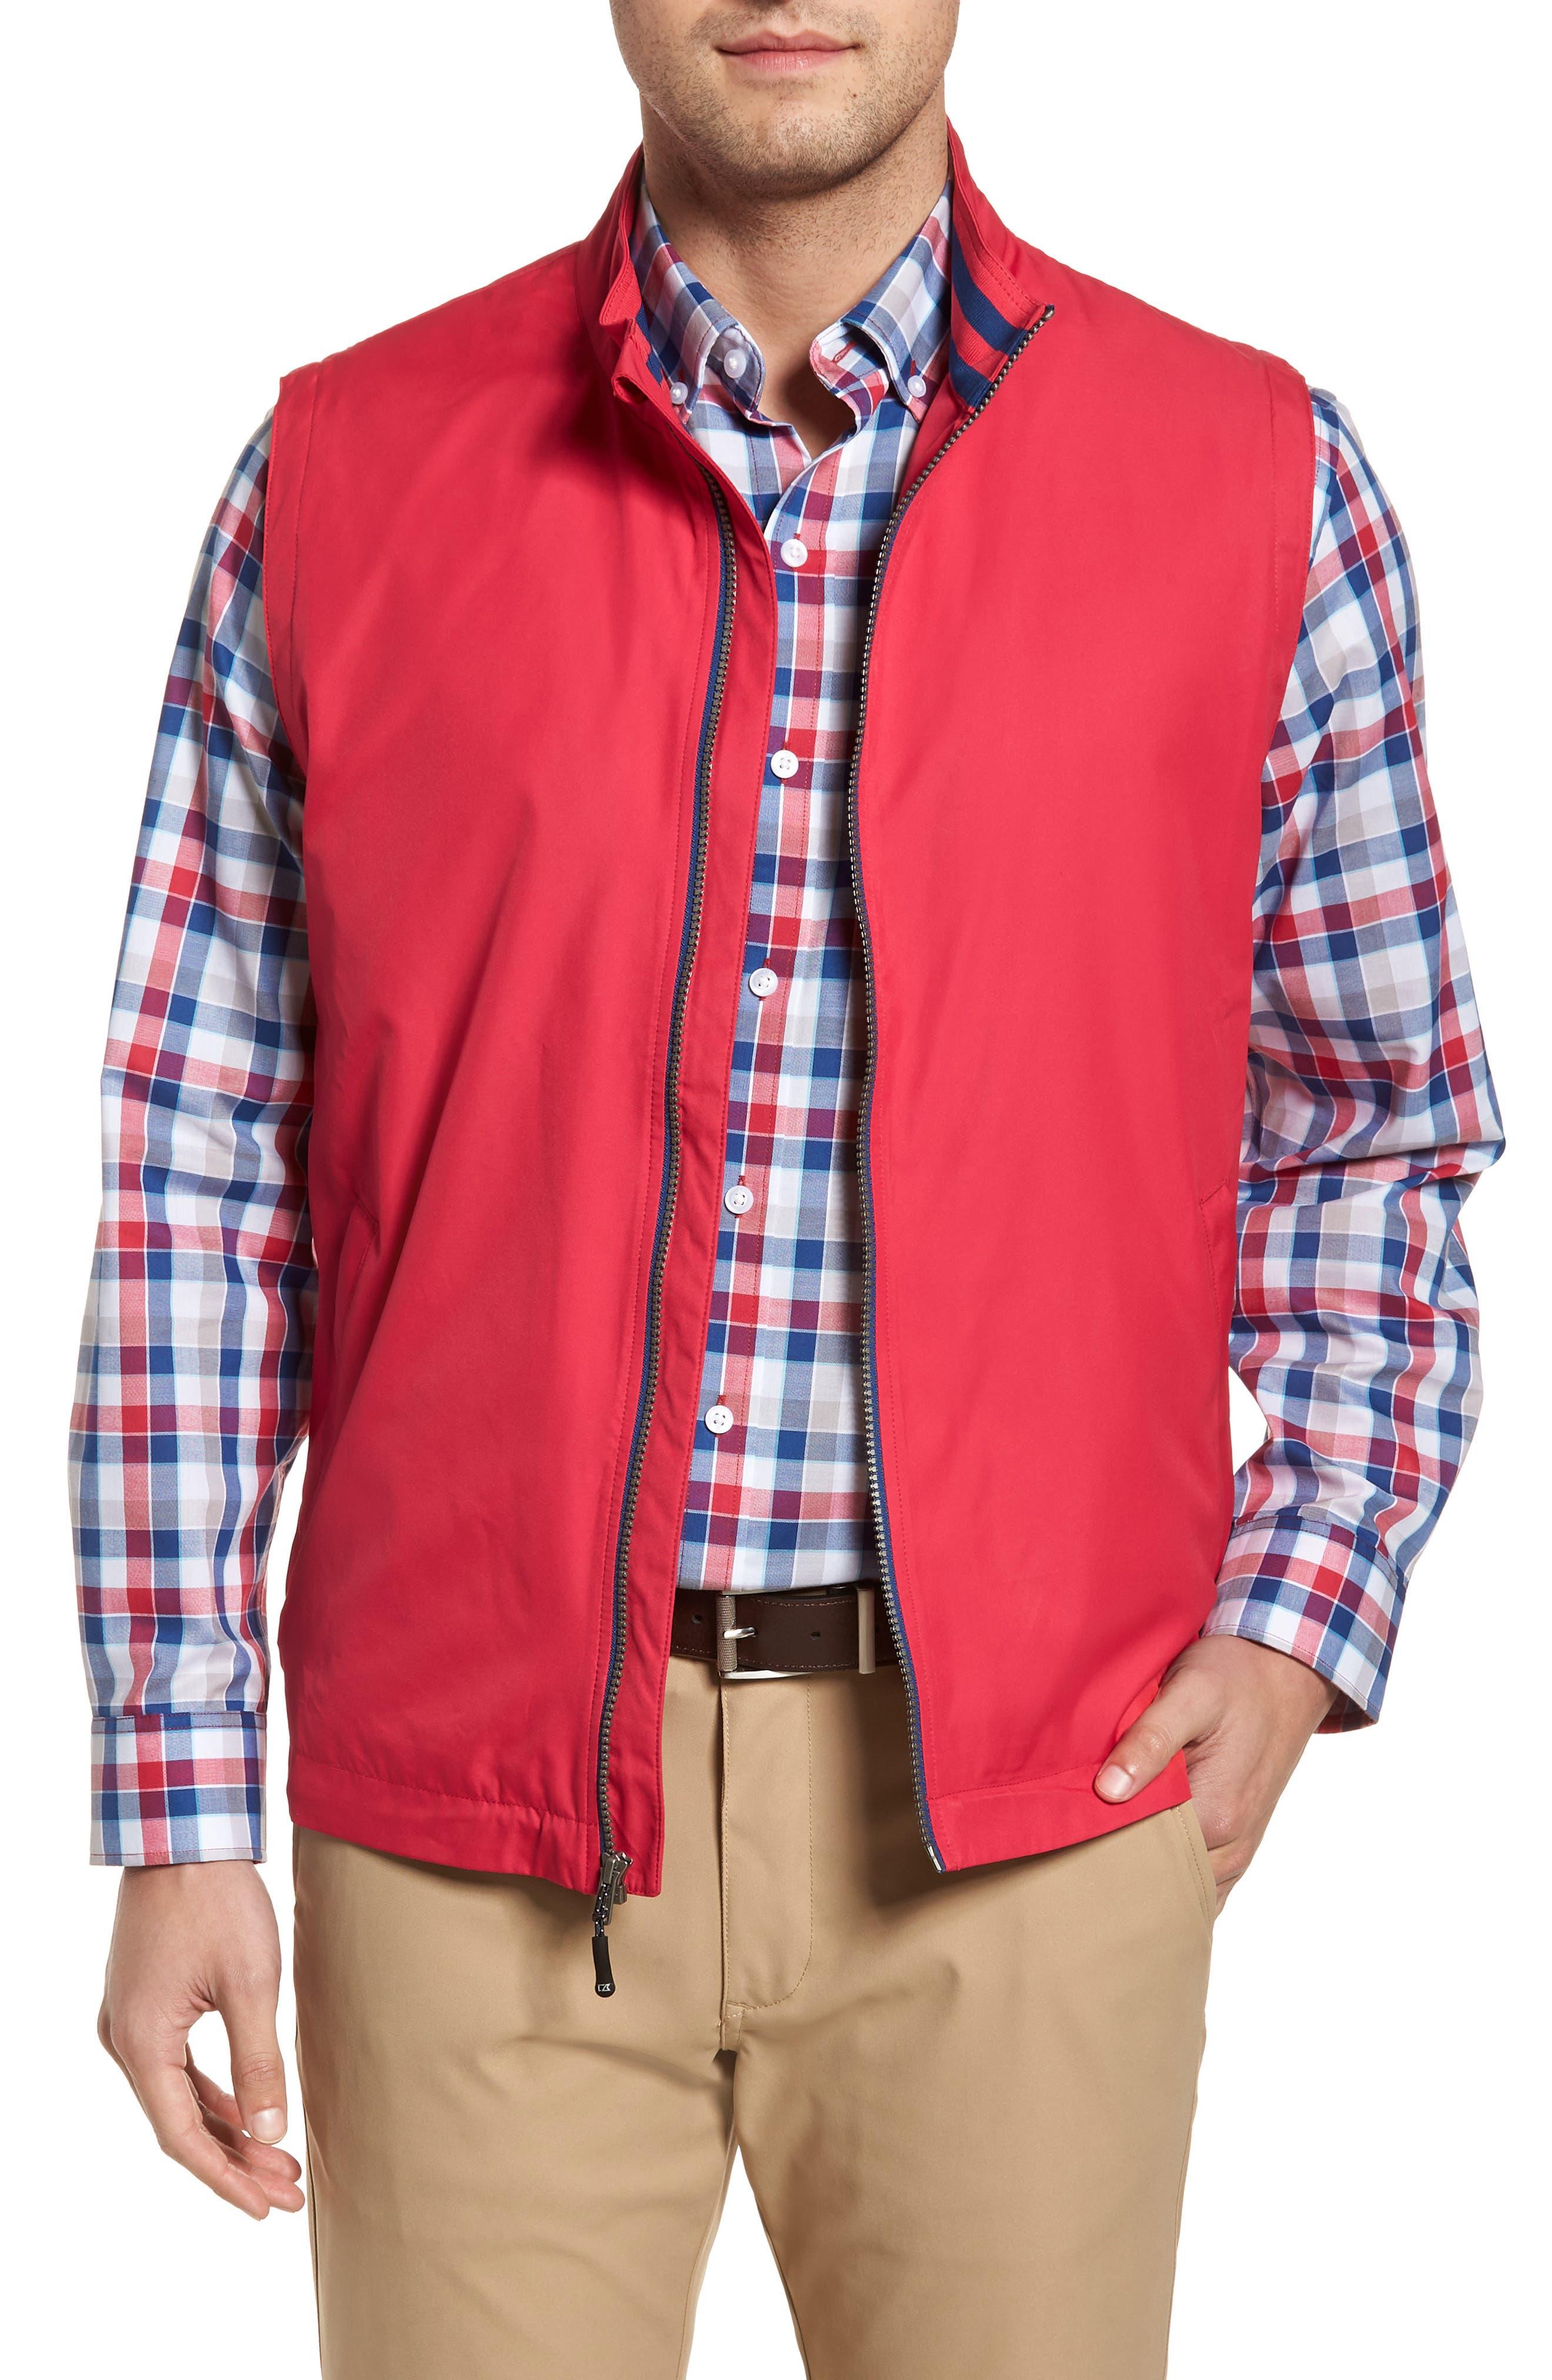 Cutter & Buck Nine Iron Drytec Zip Vest, Pink